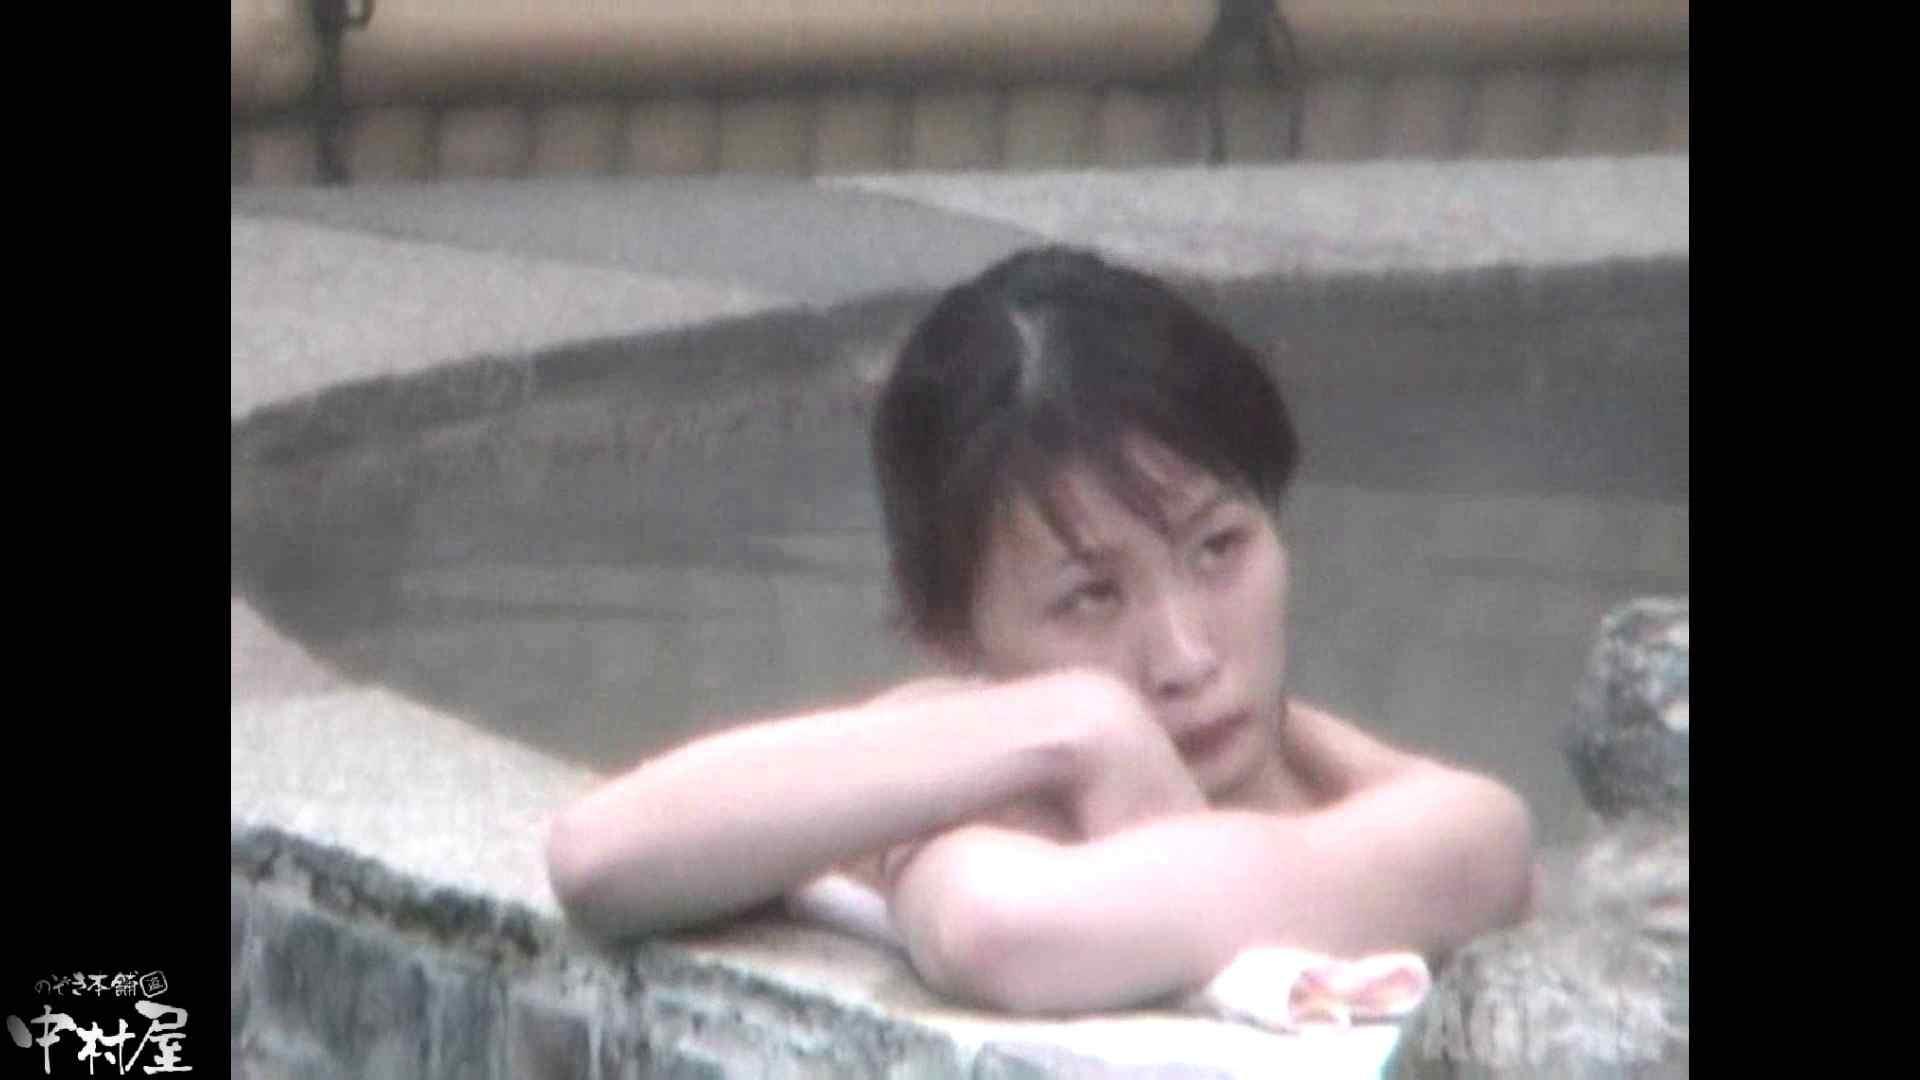 Aquaな露天風呂Vol.878潜入盗撮露天風呂十四判湯 其の三 潜入 | OLセックス  110画像 49